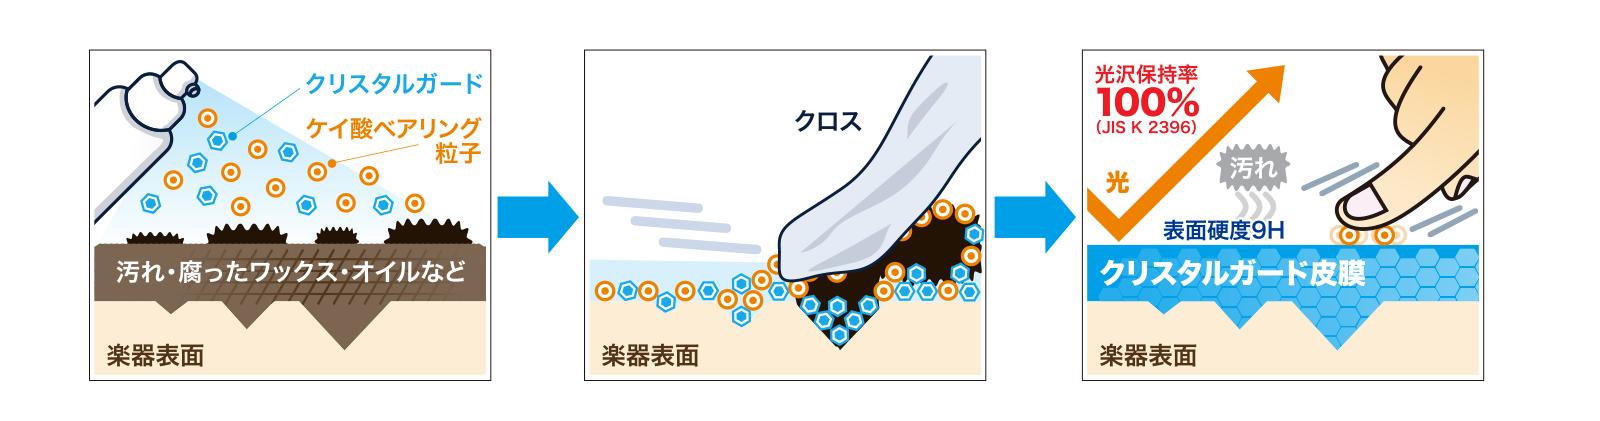 cgmi-chart